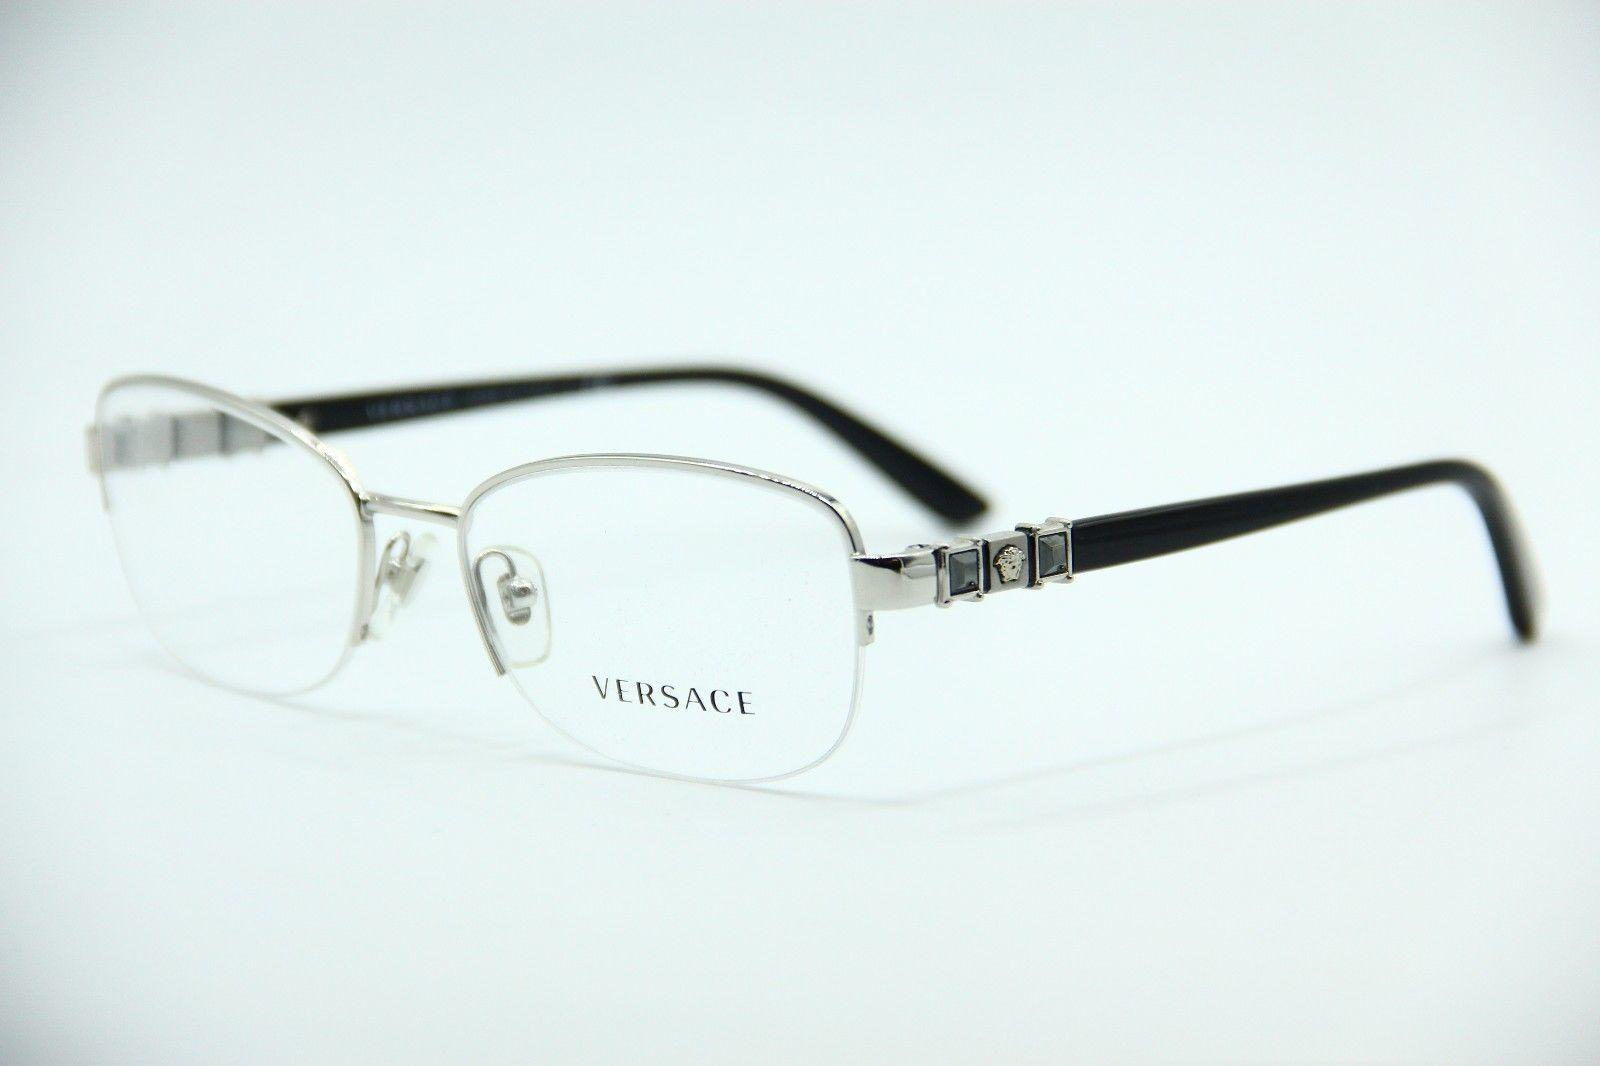 ff4de6caa1b New Versace Mod. 1230-B 1000 Silver and 50 similar items